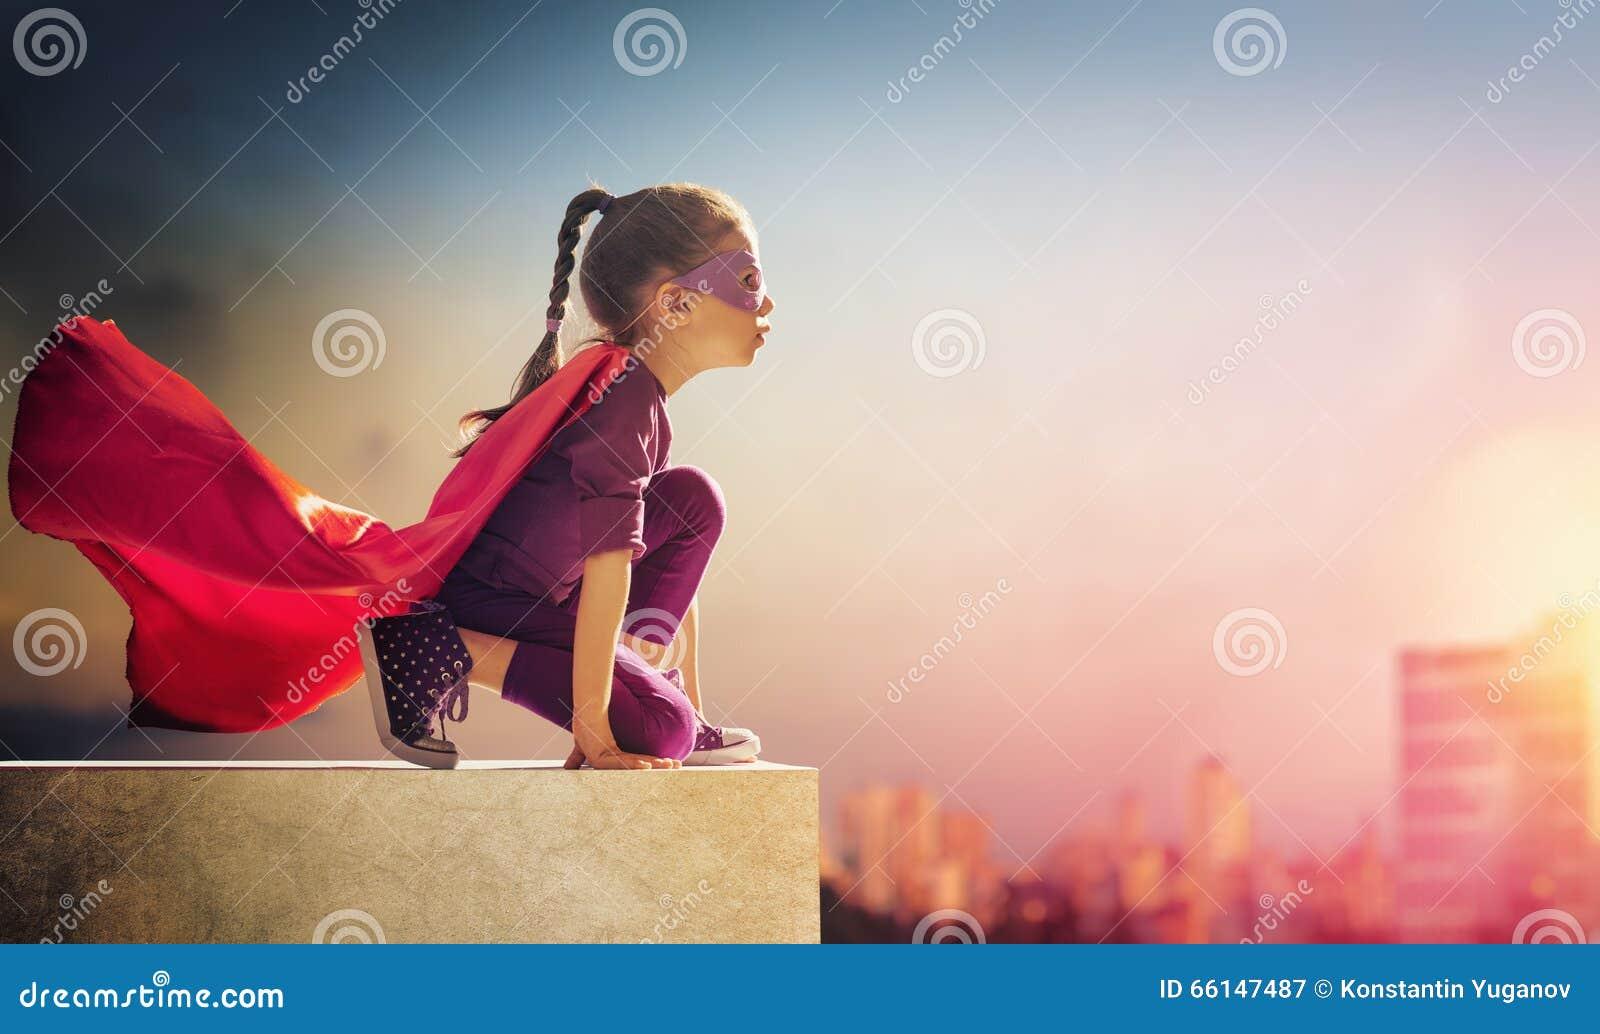 La muchacha juega al super héroe